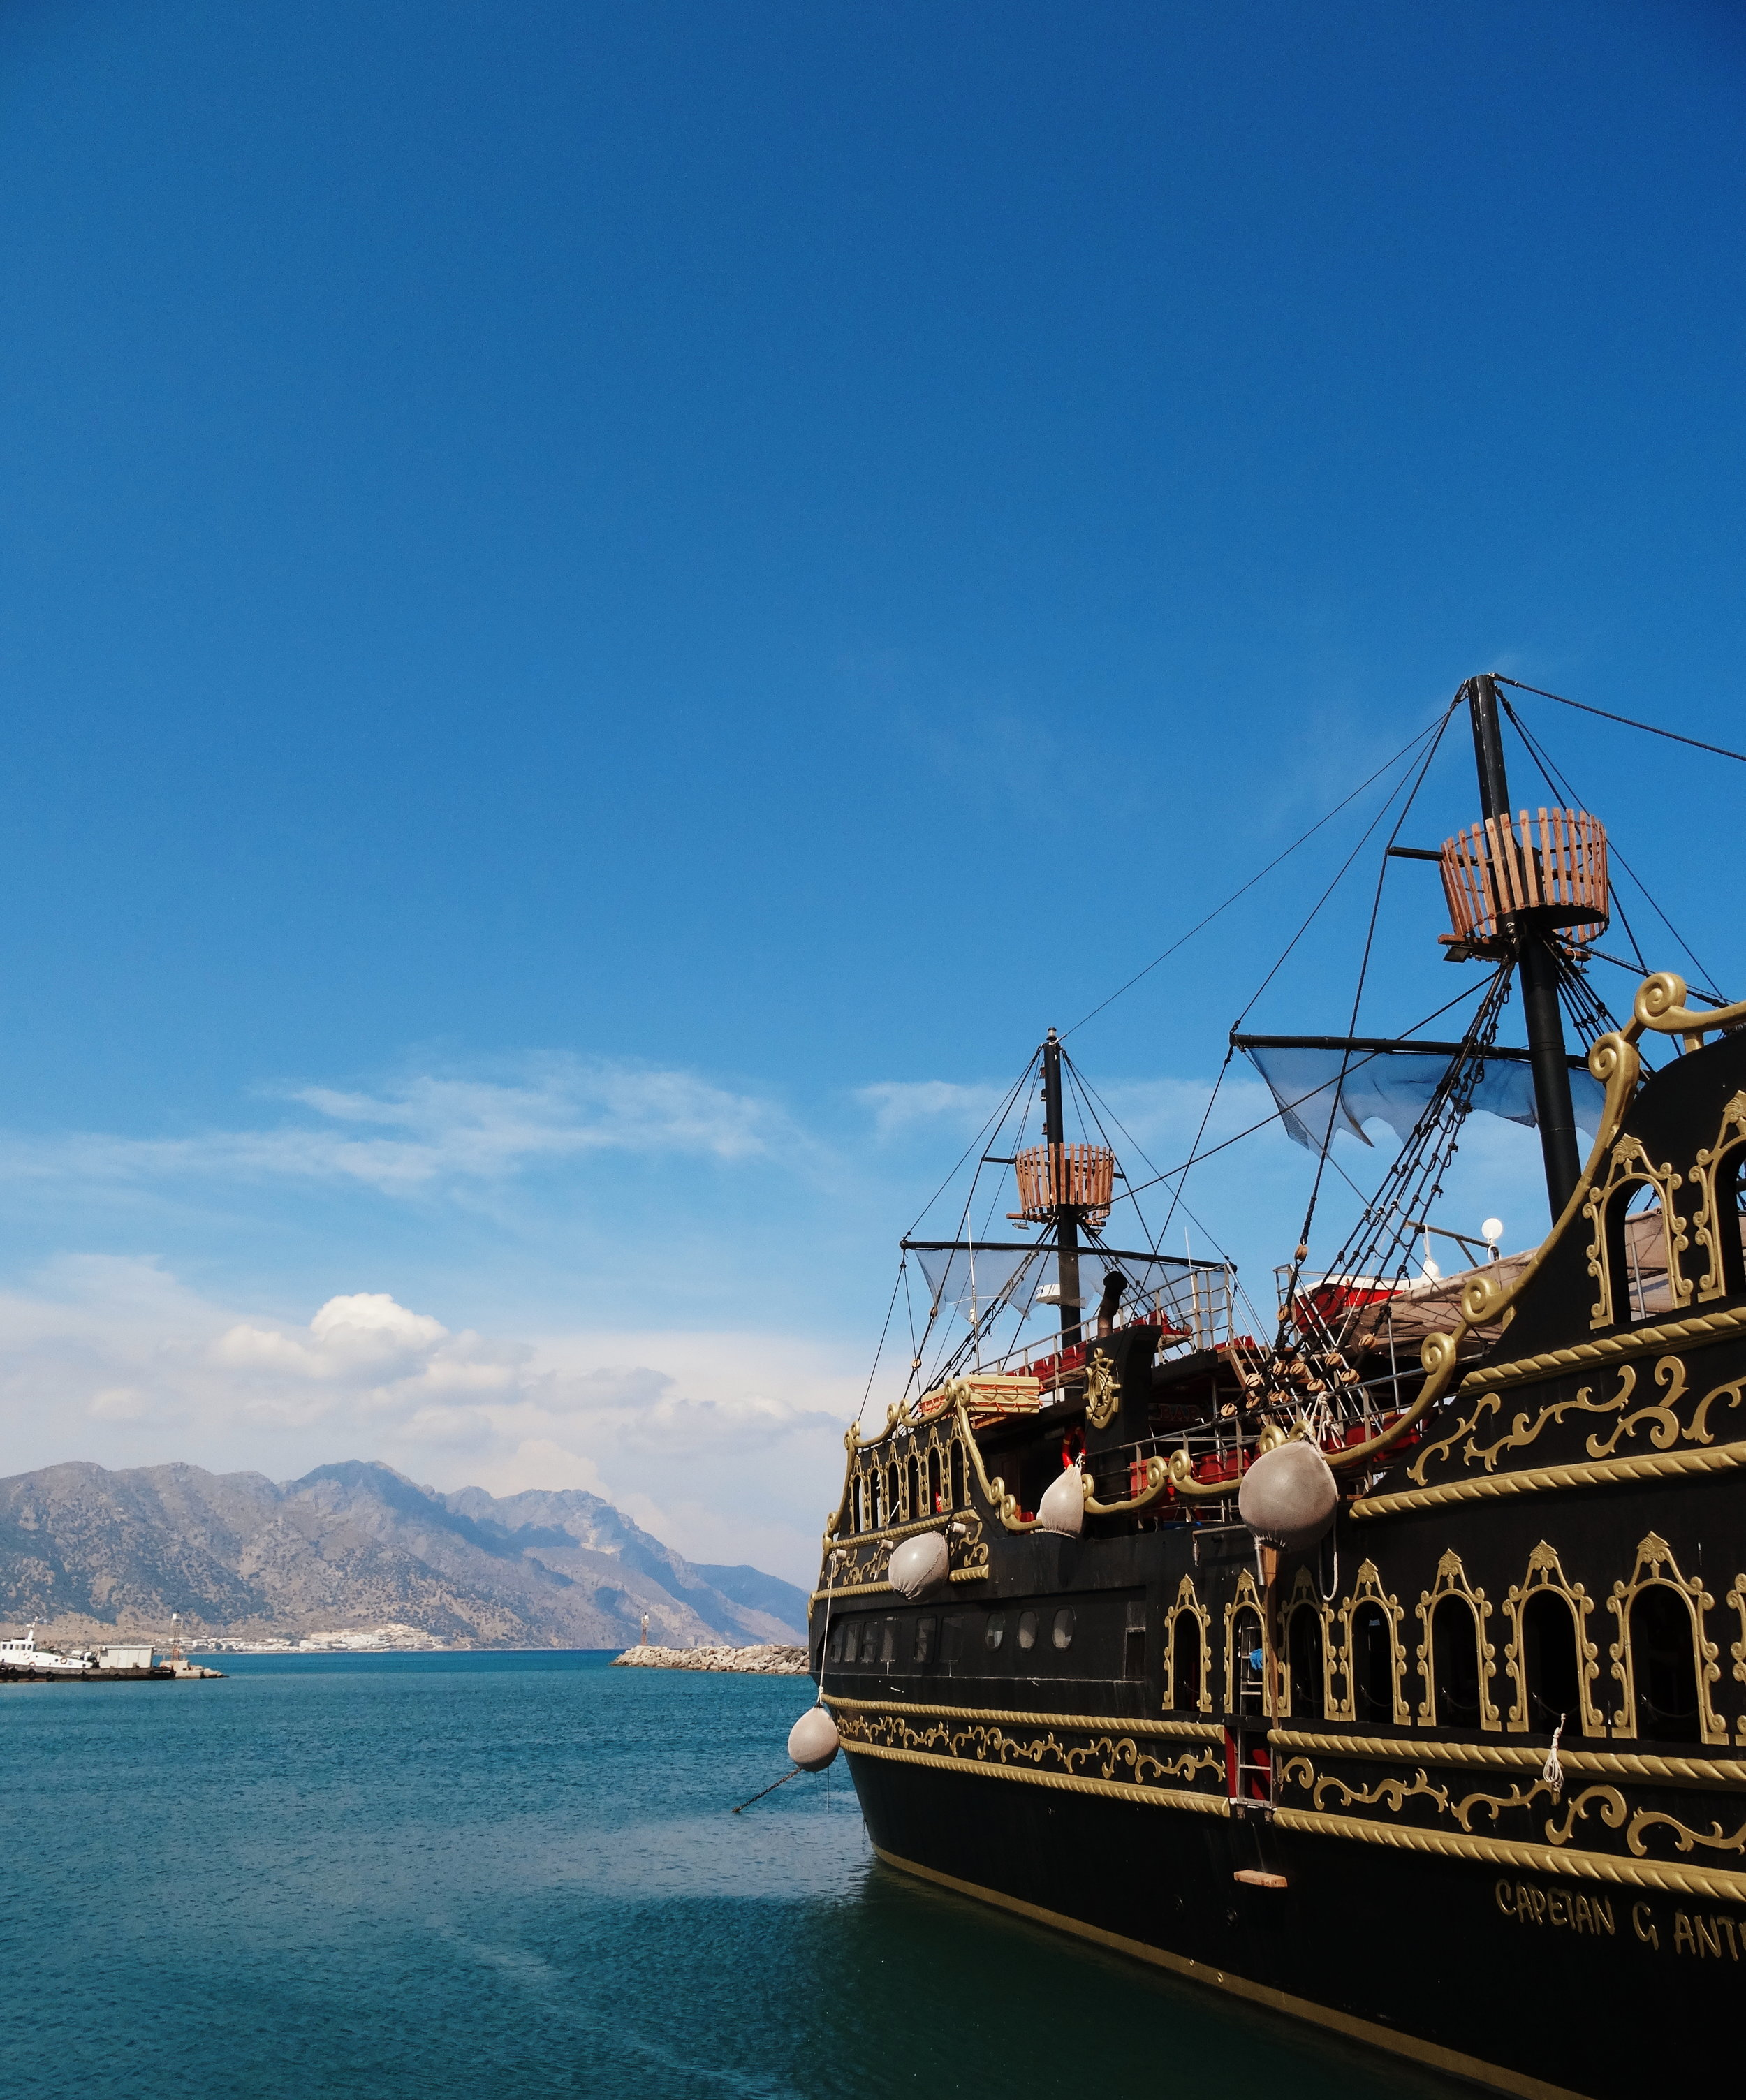 kokemuksia-kos-kreikka-kardamena-satama-ranta-mona-kajander-matkablogi